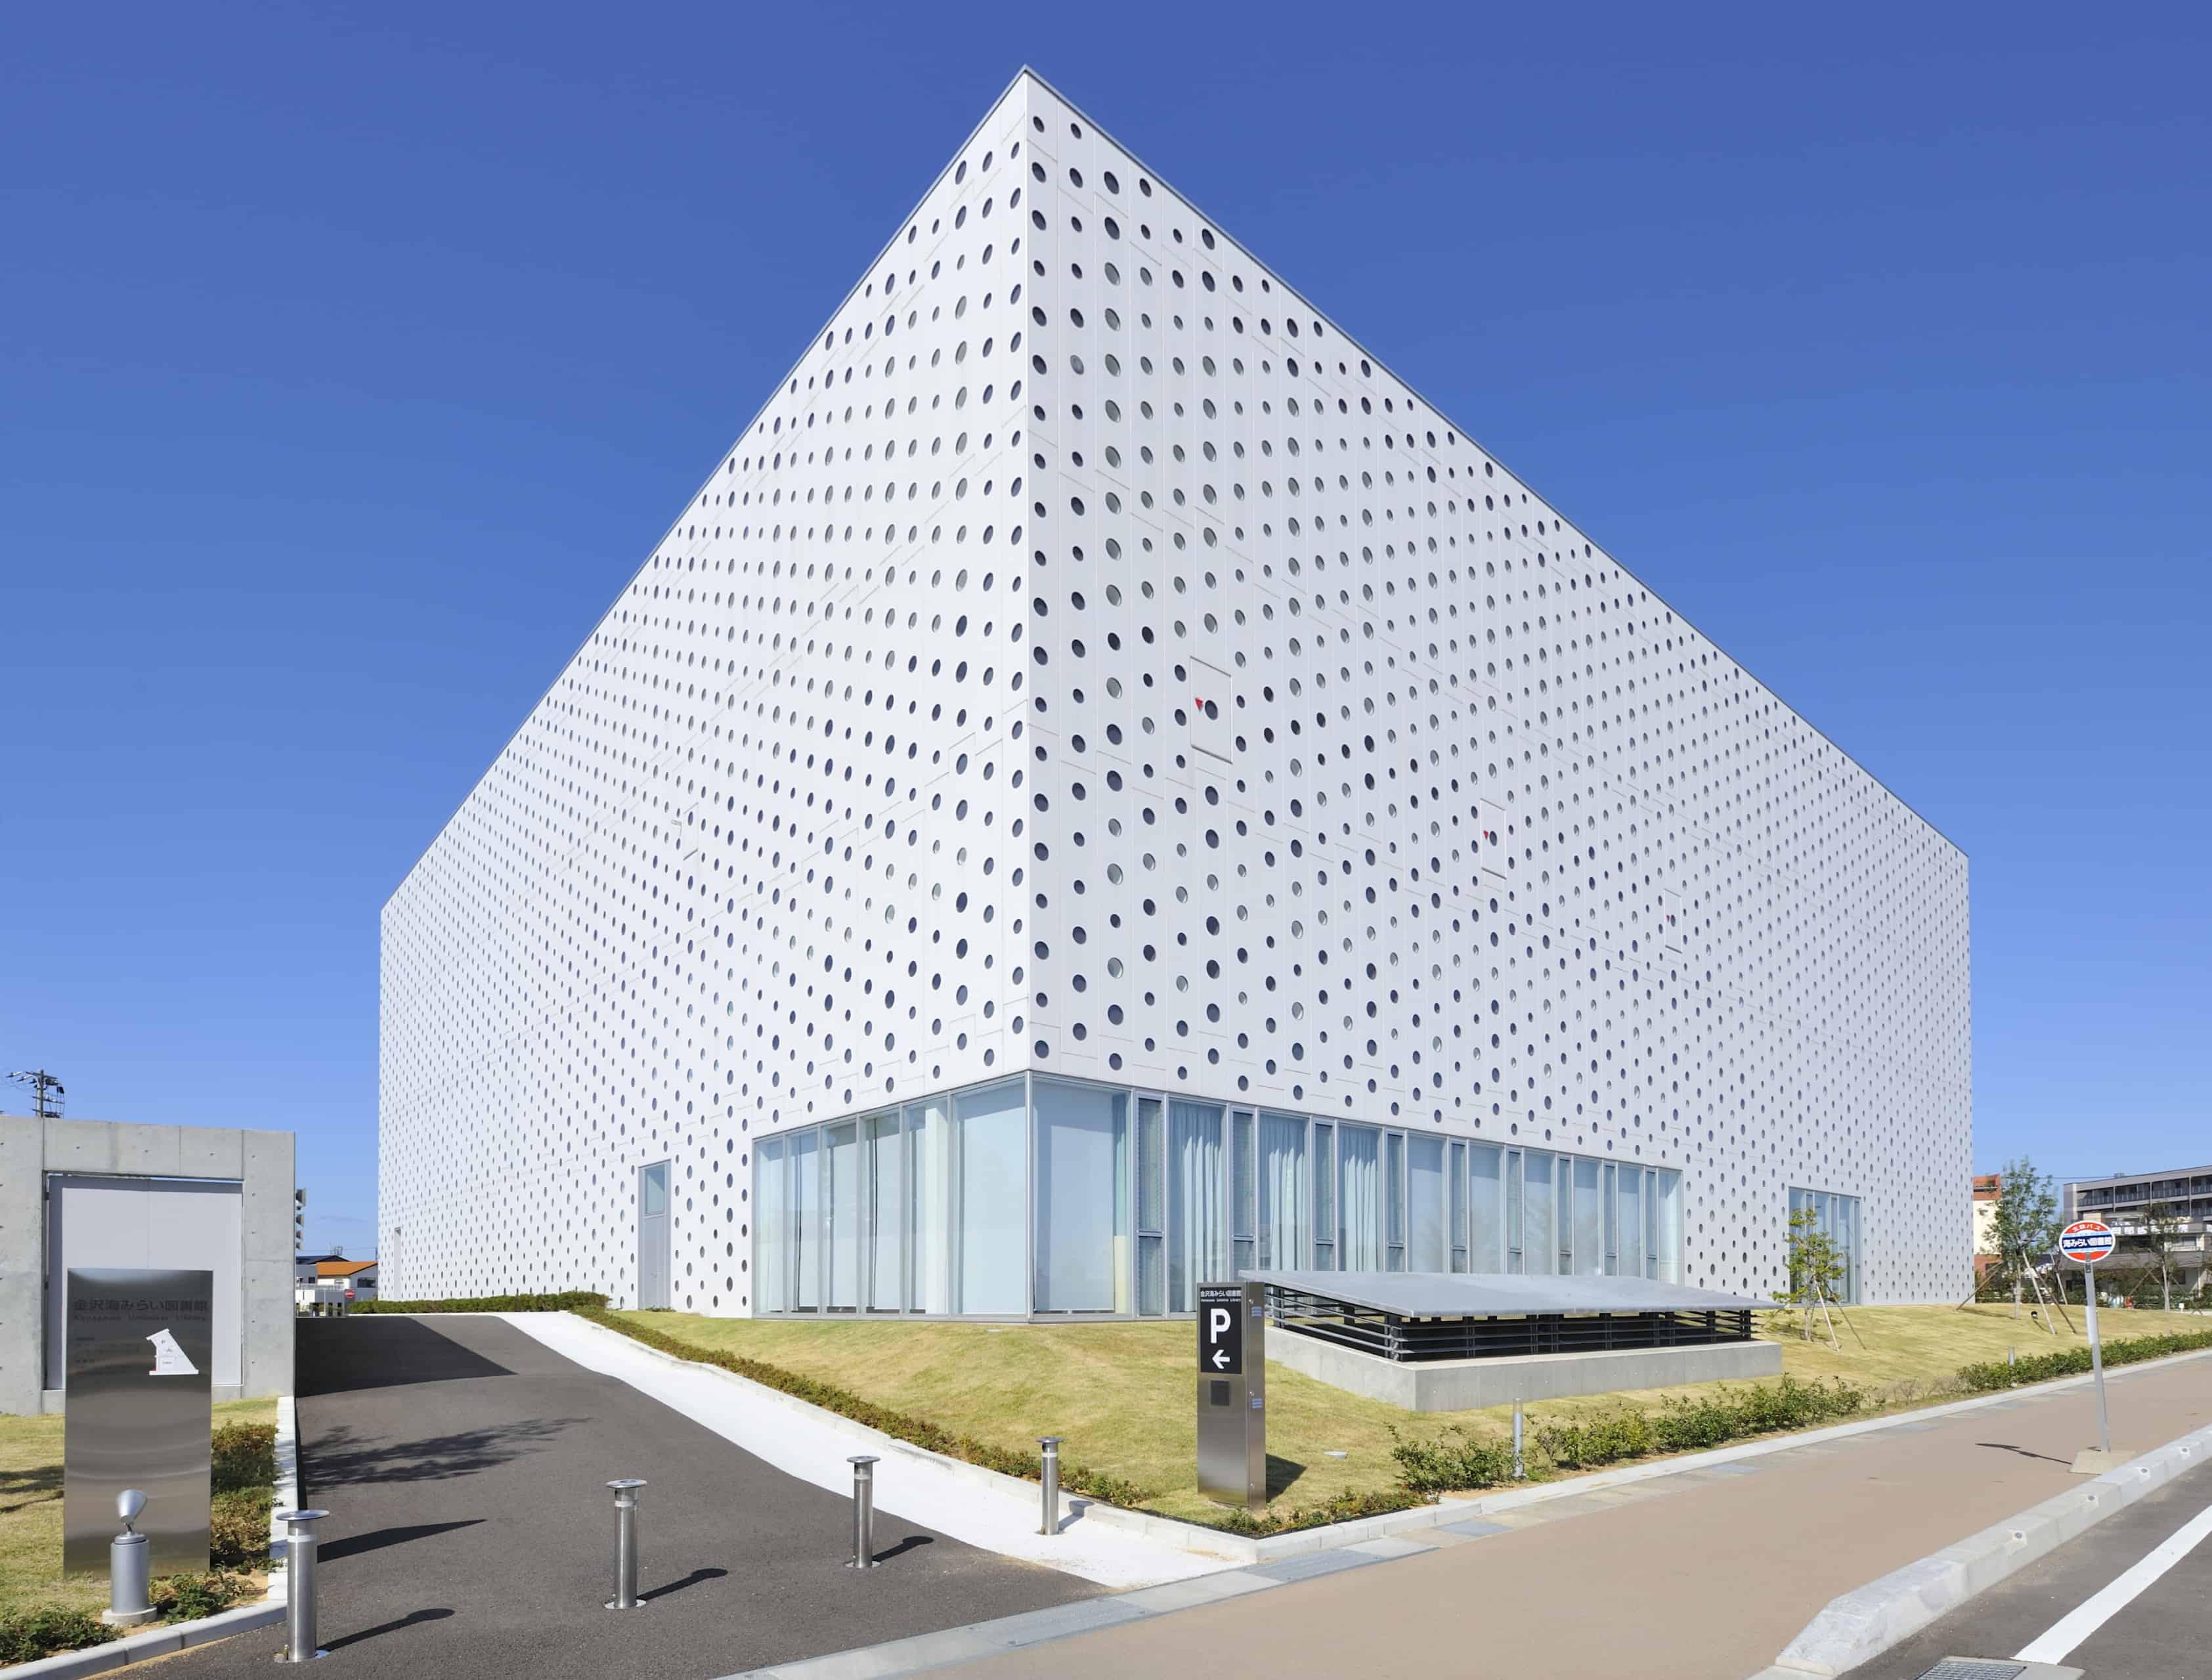 Kanazawa Umimirai Library | Ishikawa ห้องสมุด ที่สวยที่สุดใน ญี่ปุ่น